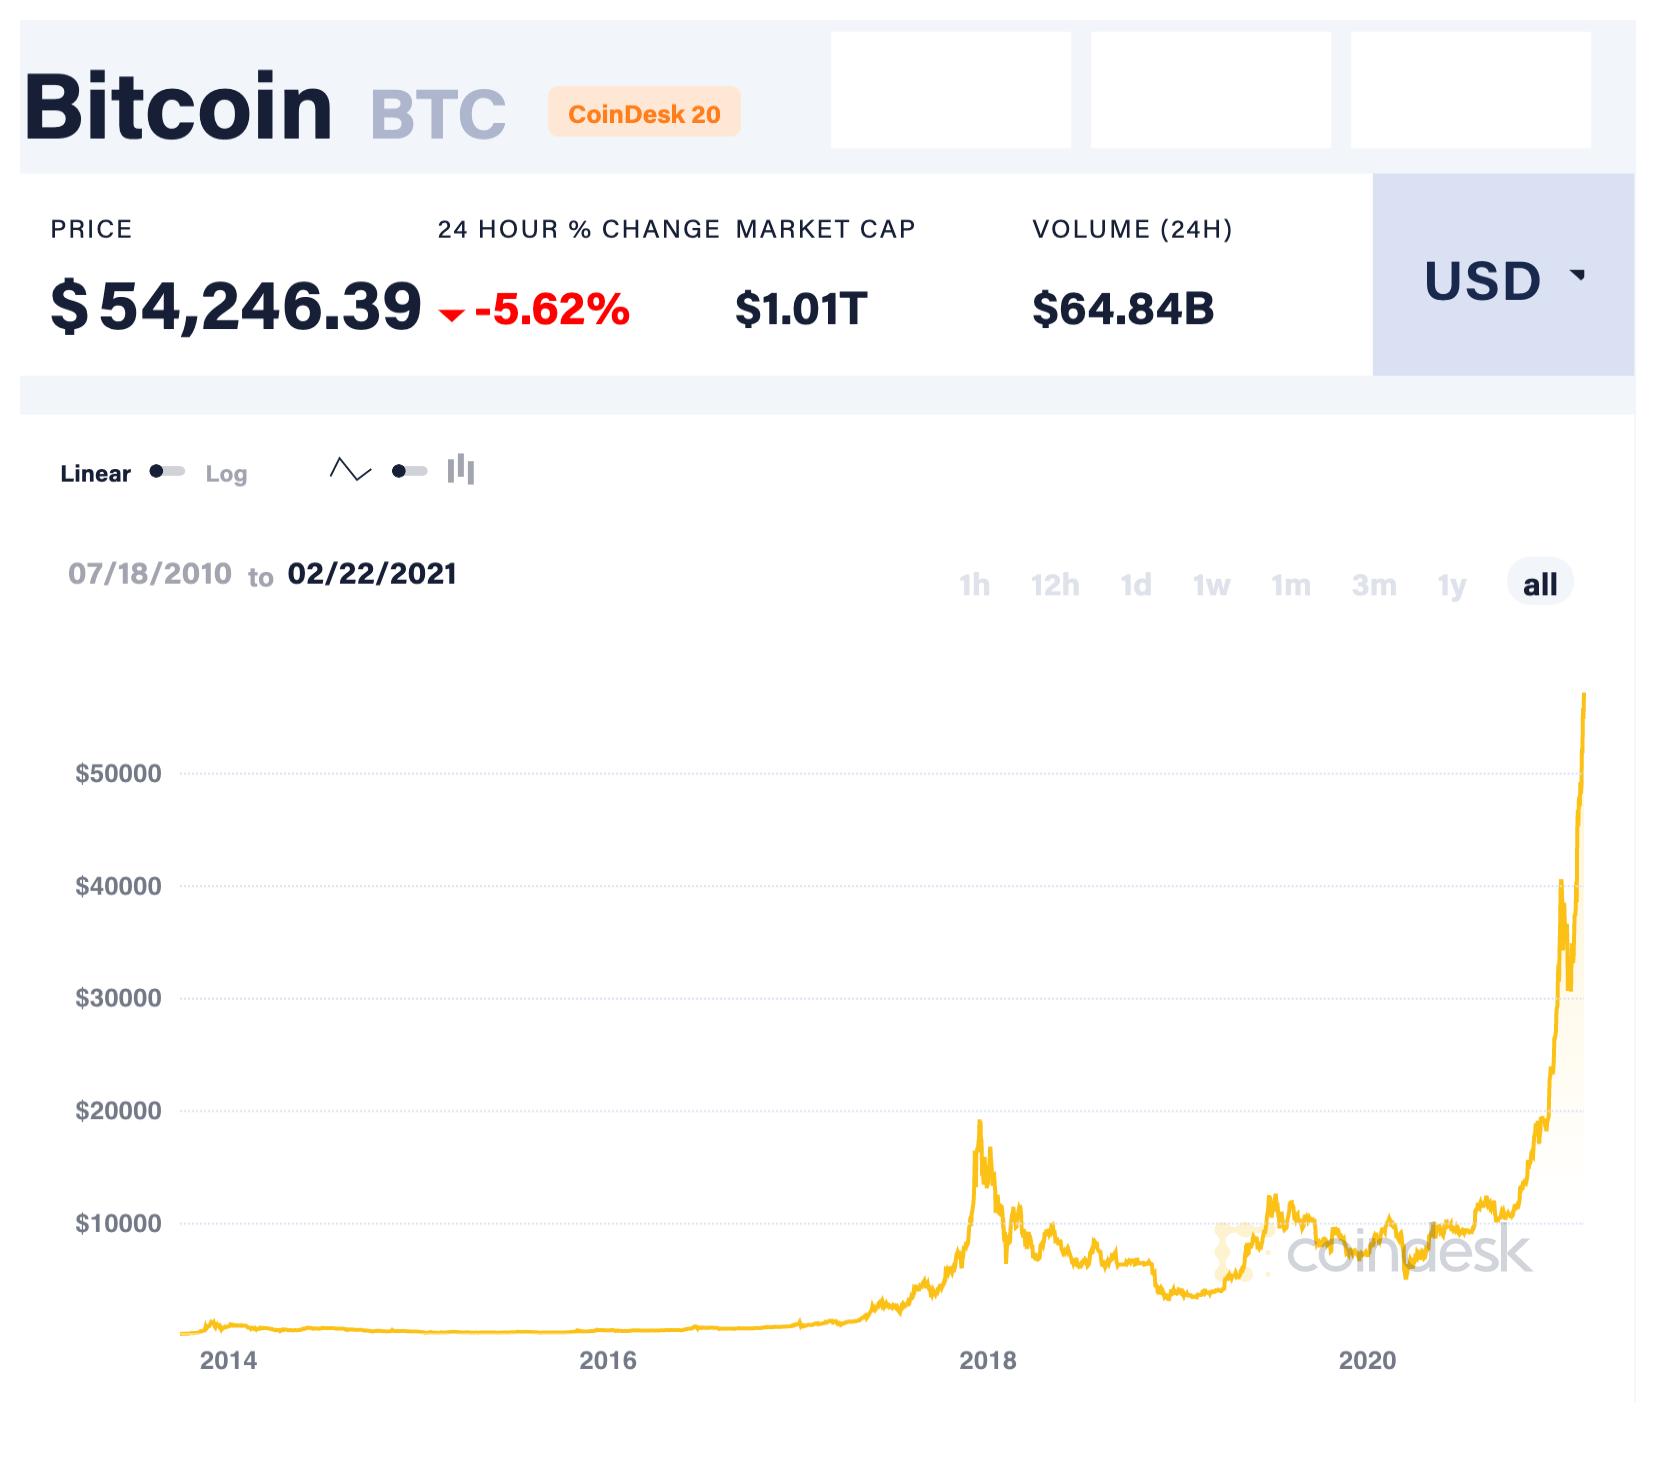 coindesk-BTC-chart-2021-02-22 (1)